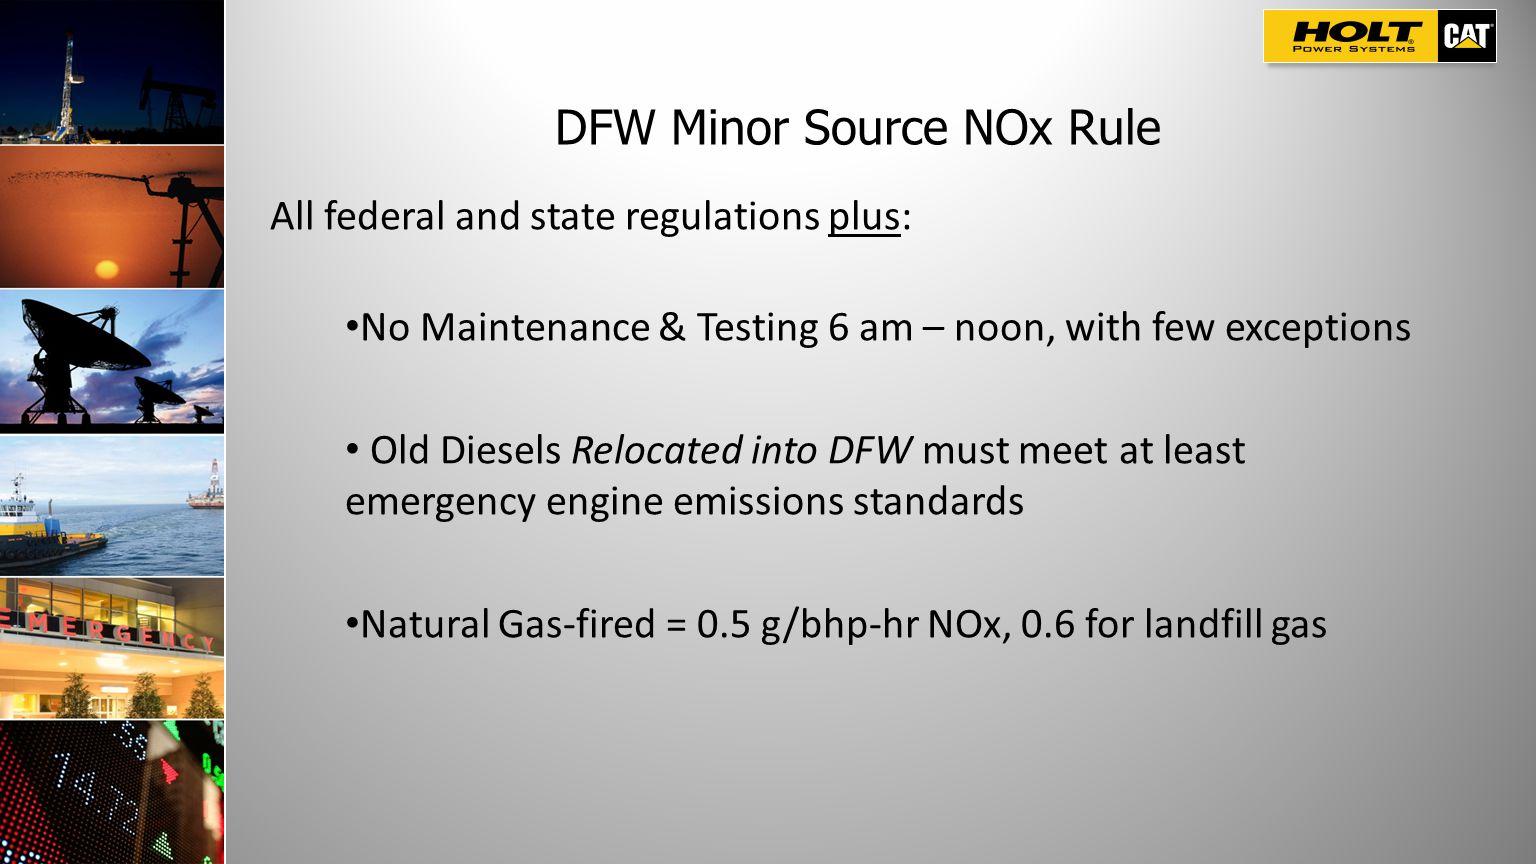 DFW Minor Source NOx Rule